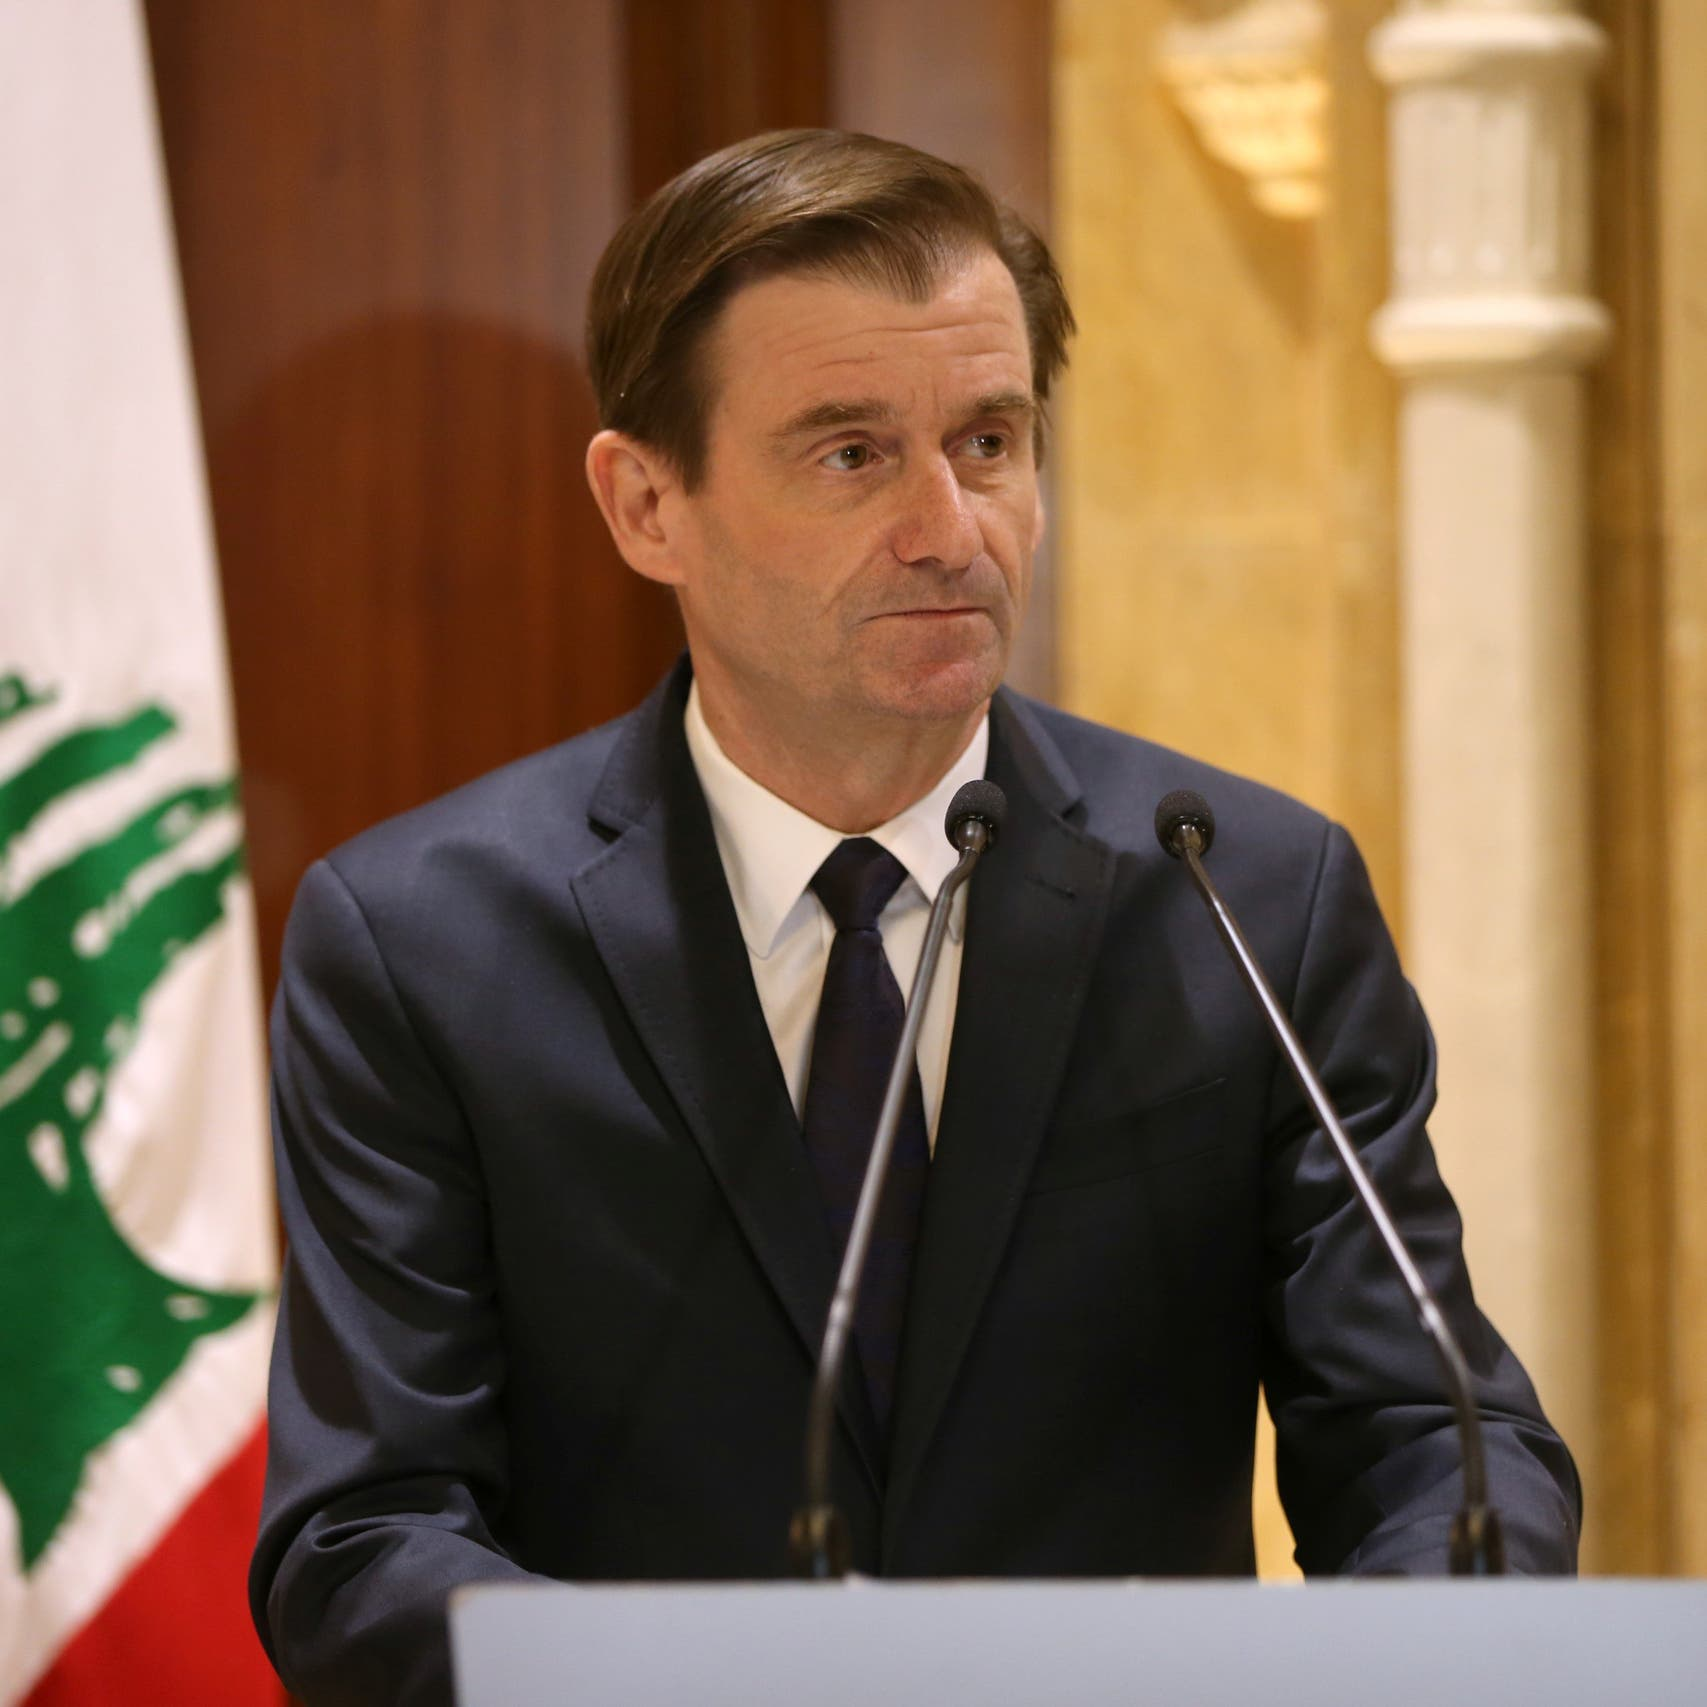 Resolving border talks with Israel will benefit crisis-hit Lebanon: US envoy